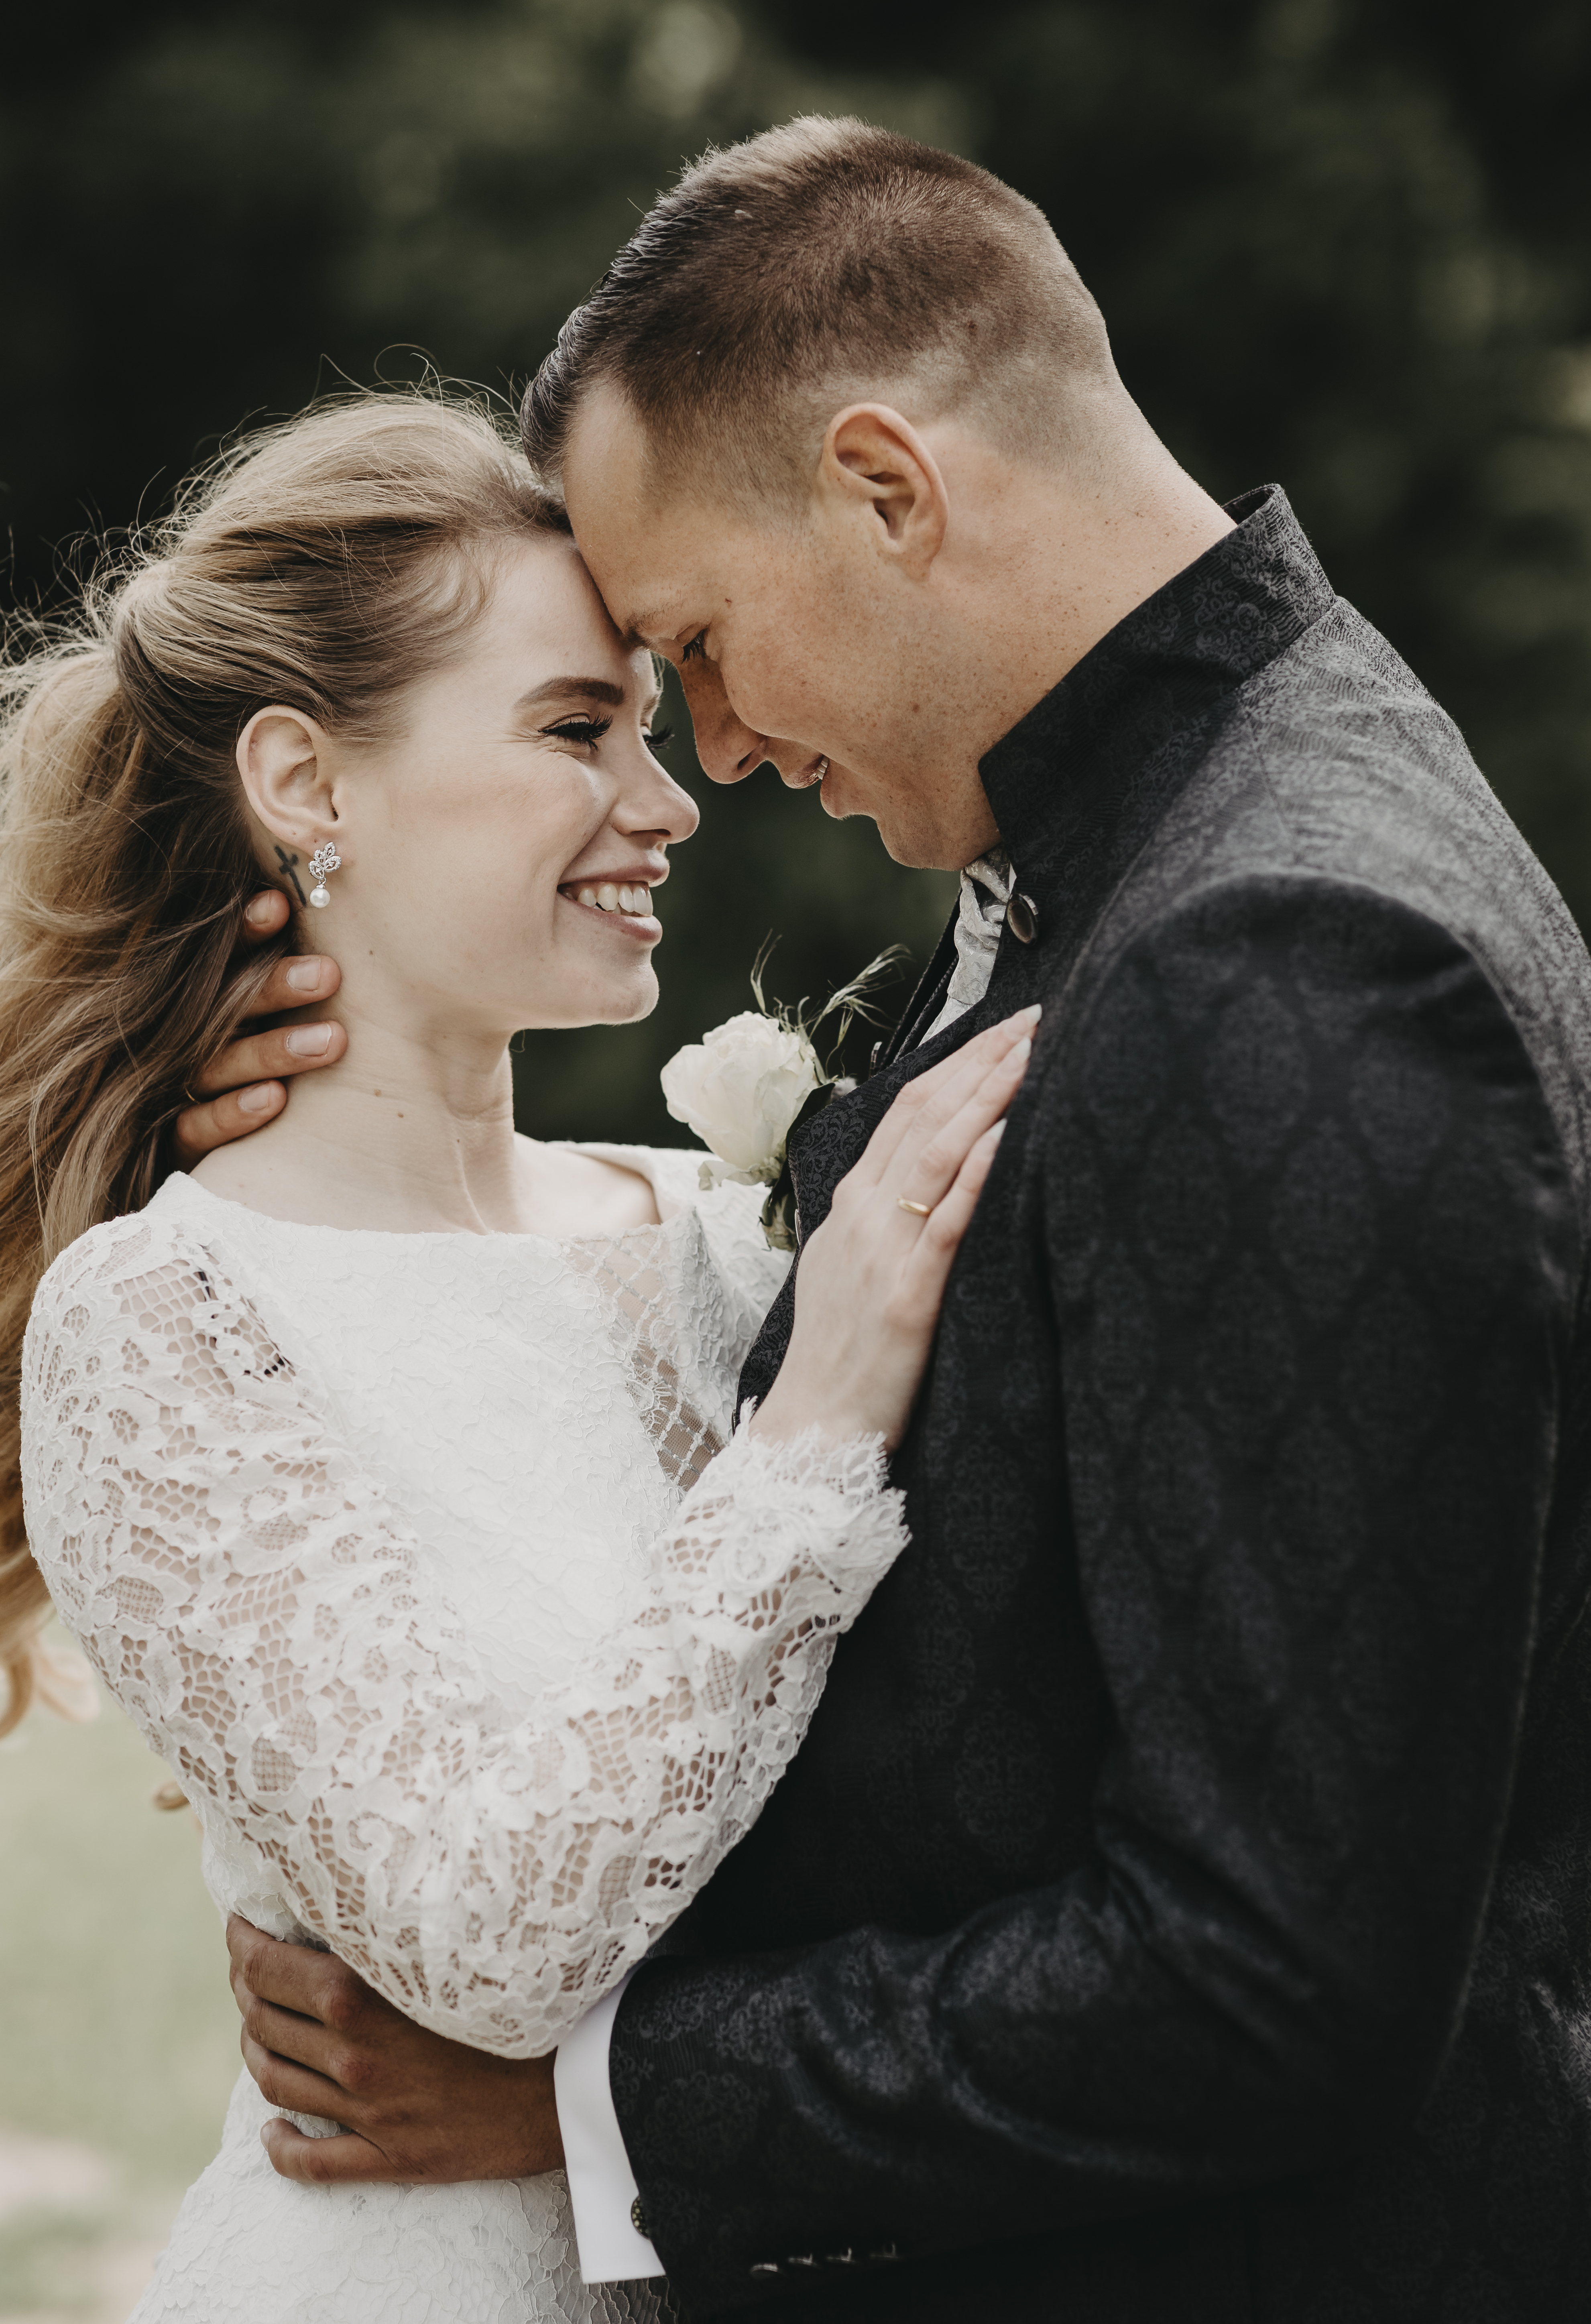 Married-at-First-Sight-Denmark-Season-6-2019-Christina-Michael